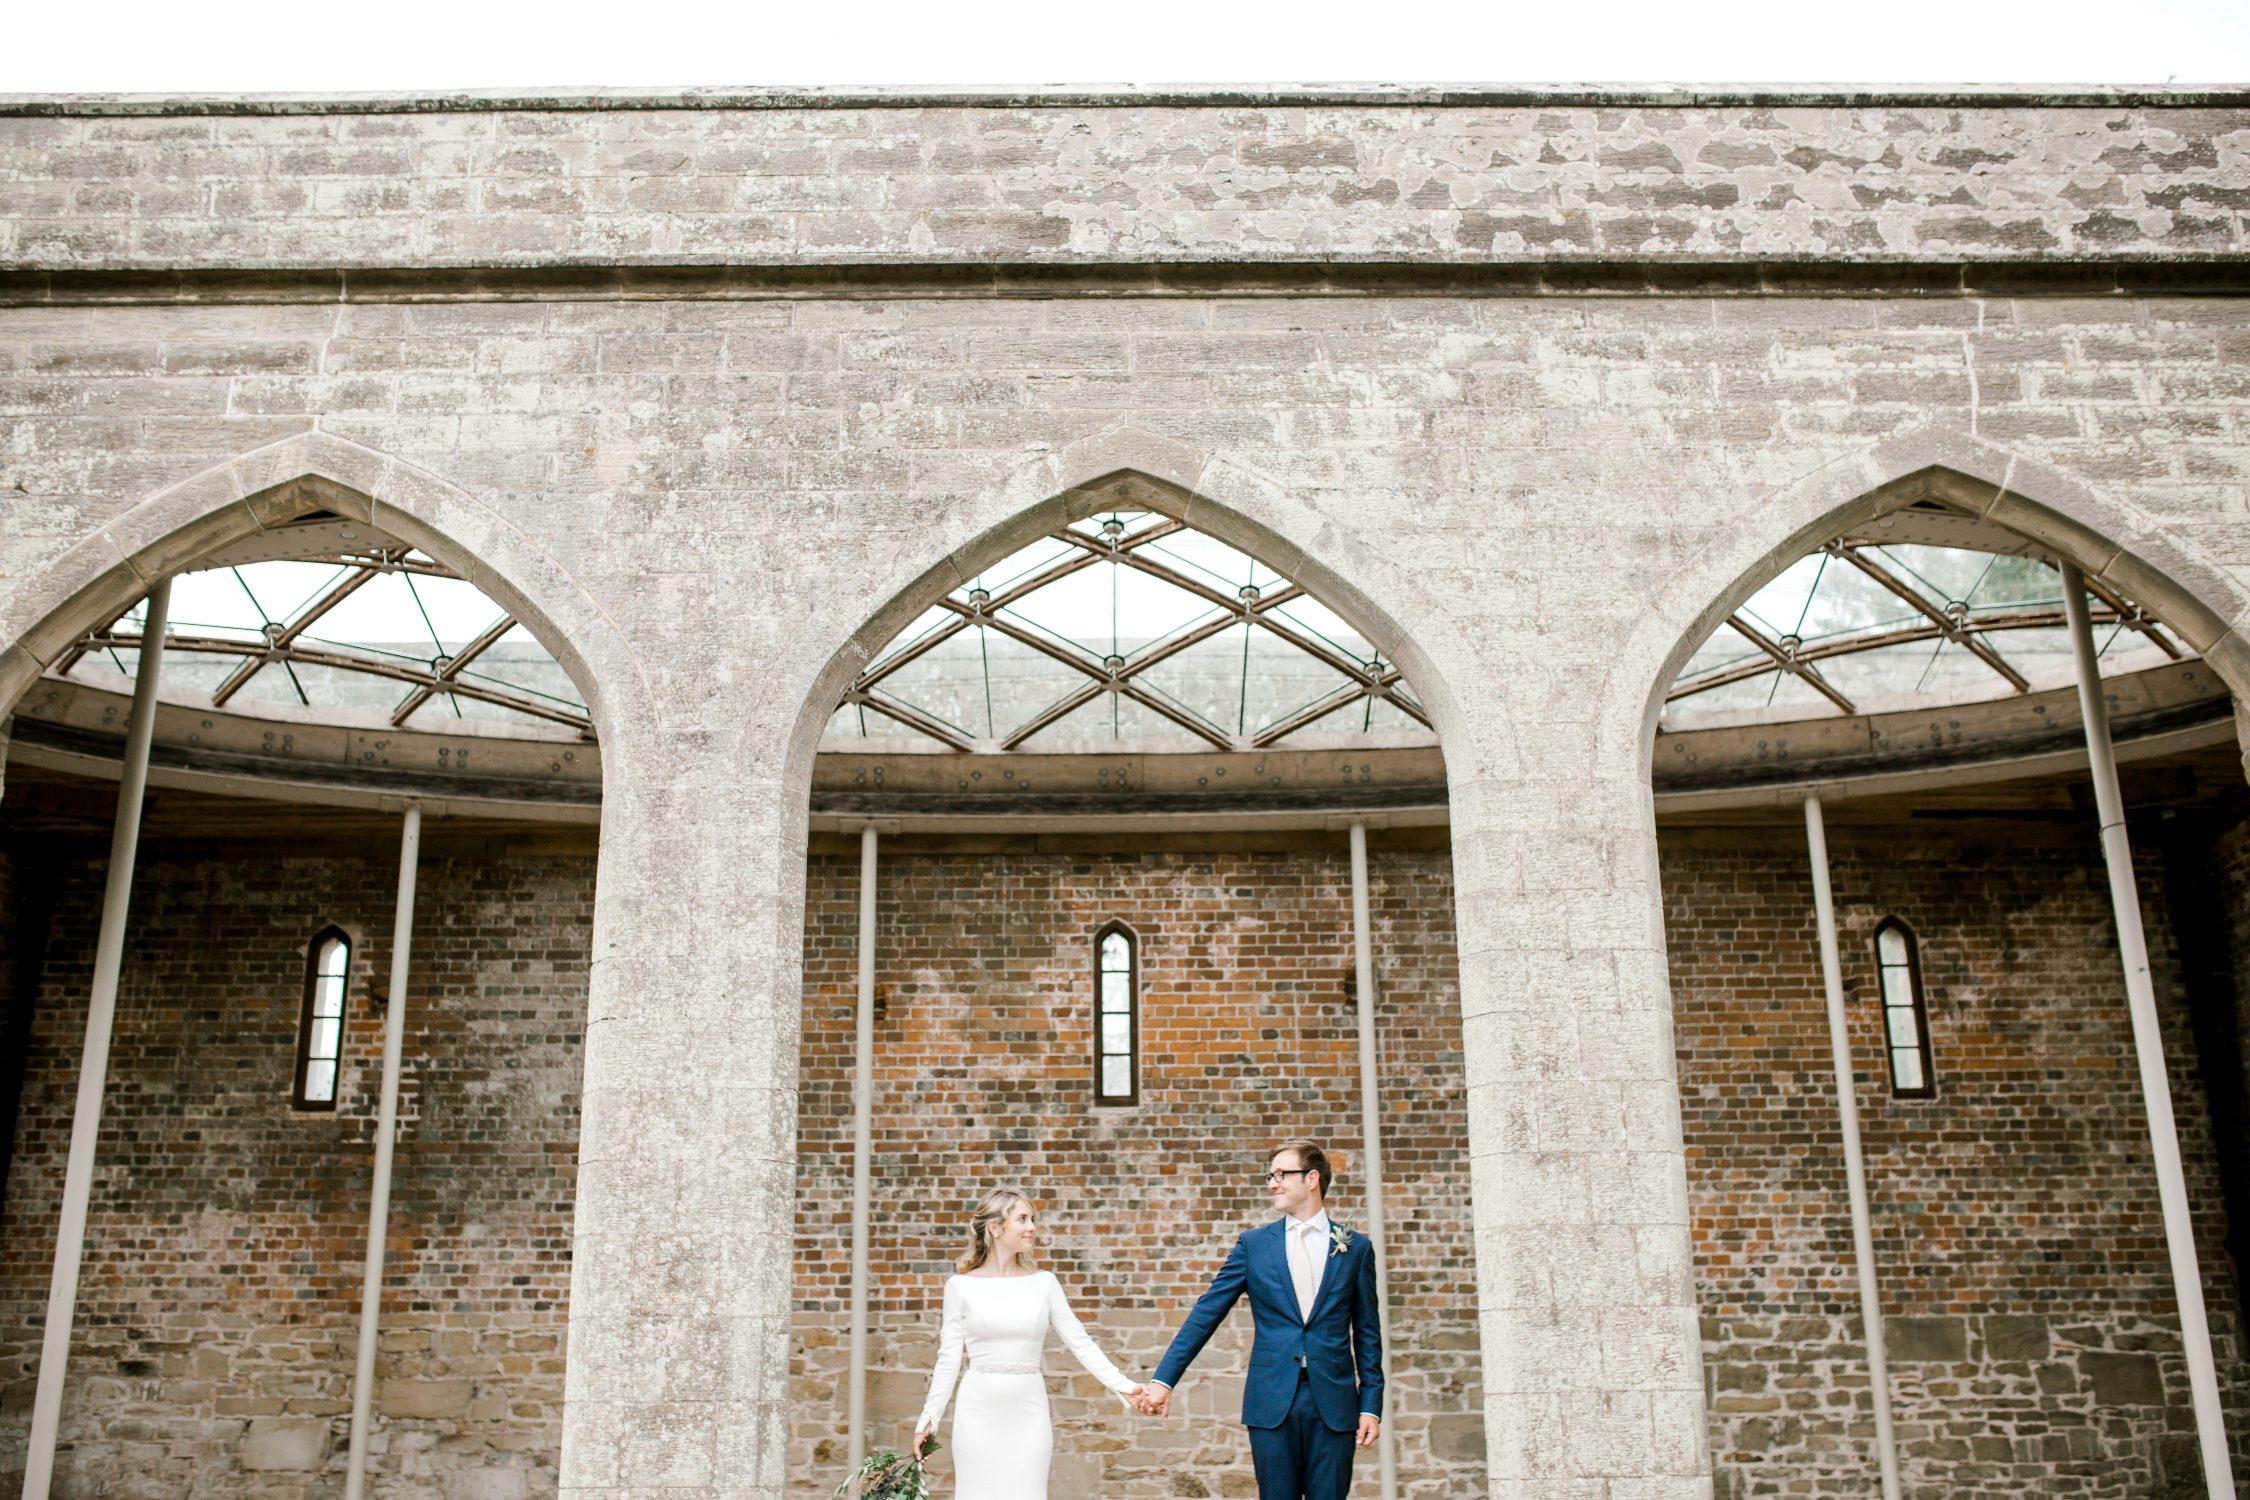 Chiddingstone Castle Wedding - Mikaella Bridal 2105 - Sam Areman Photo